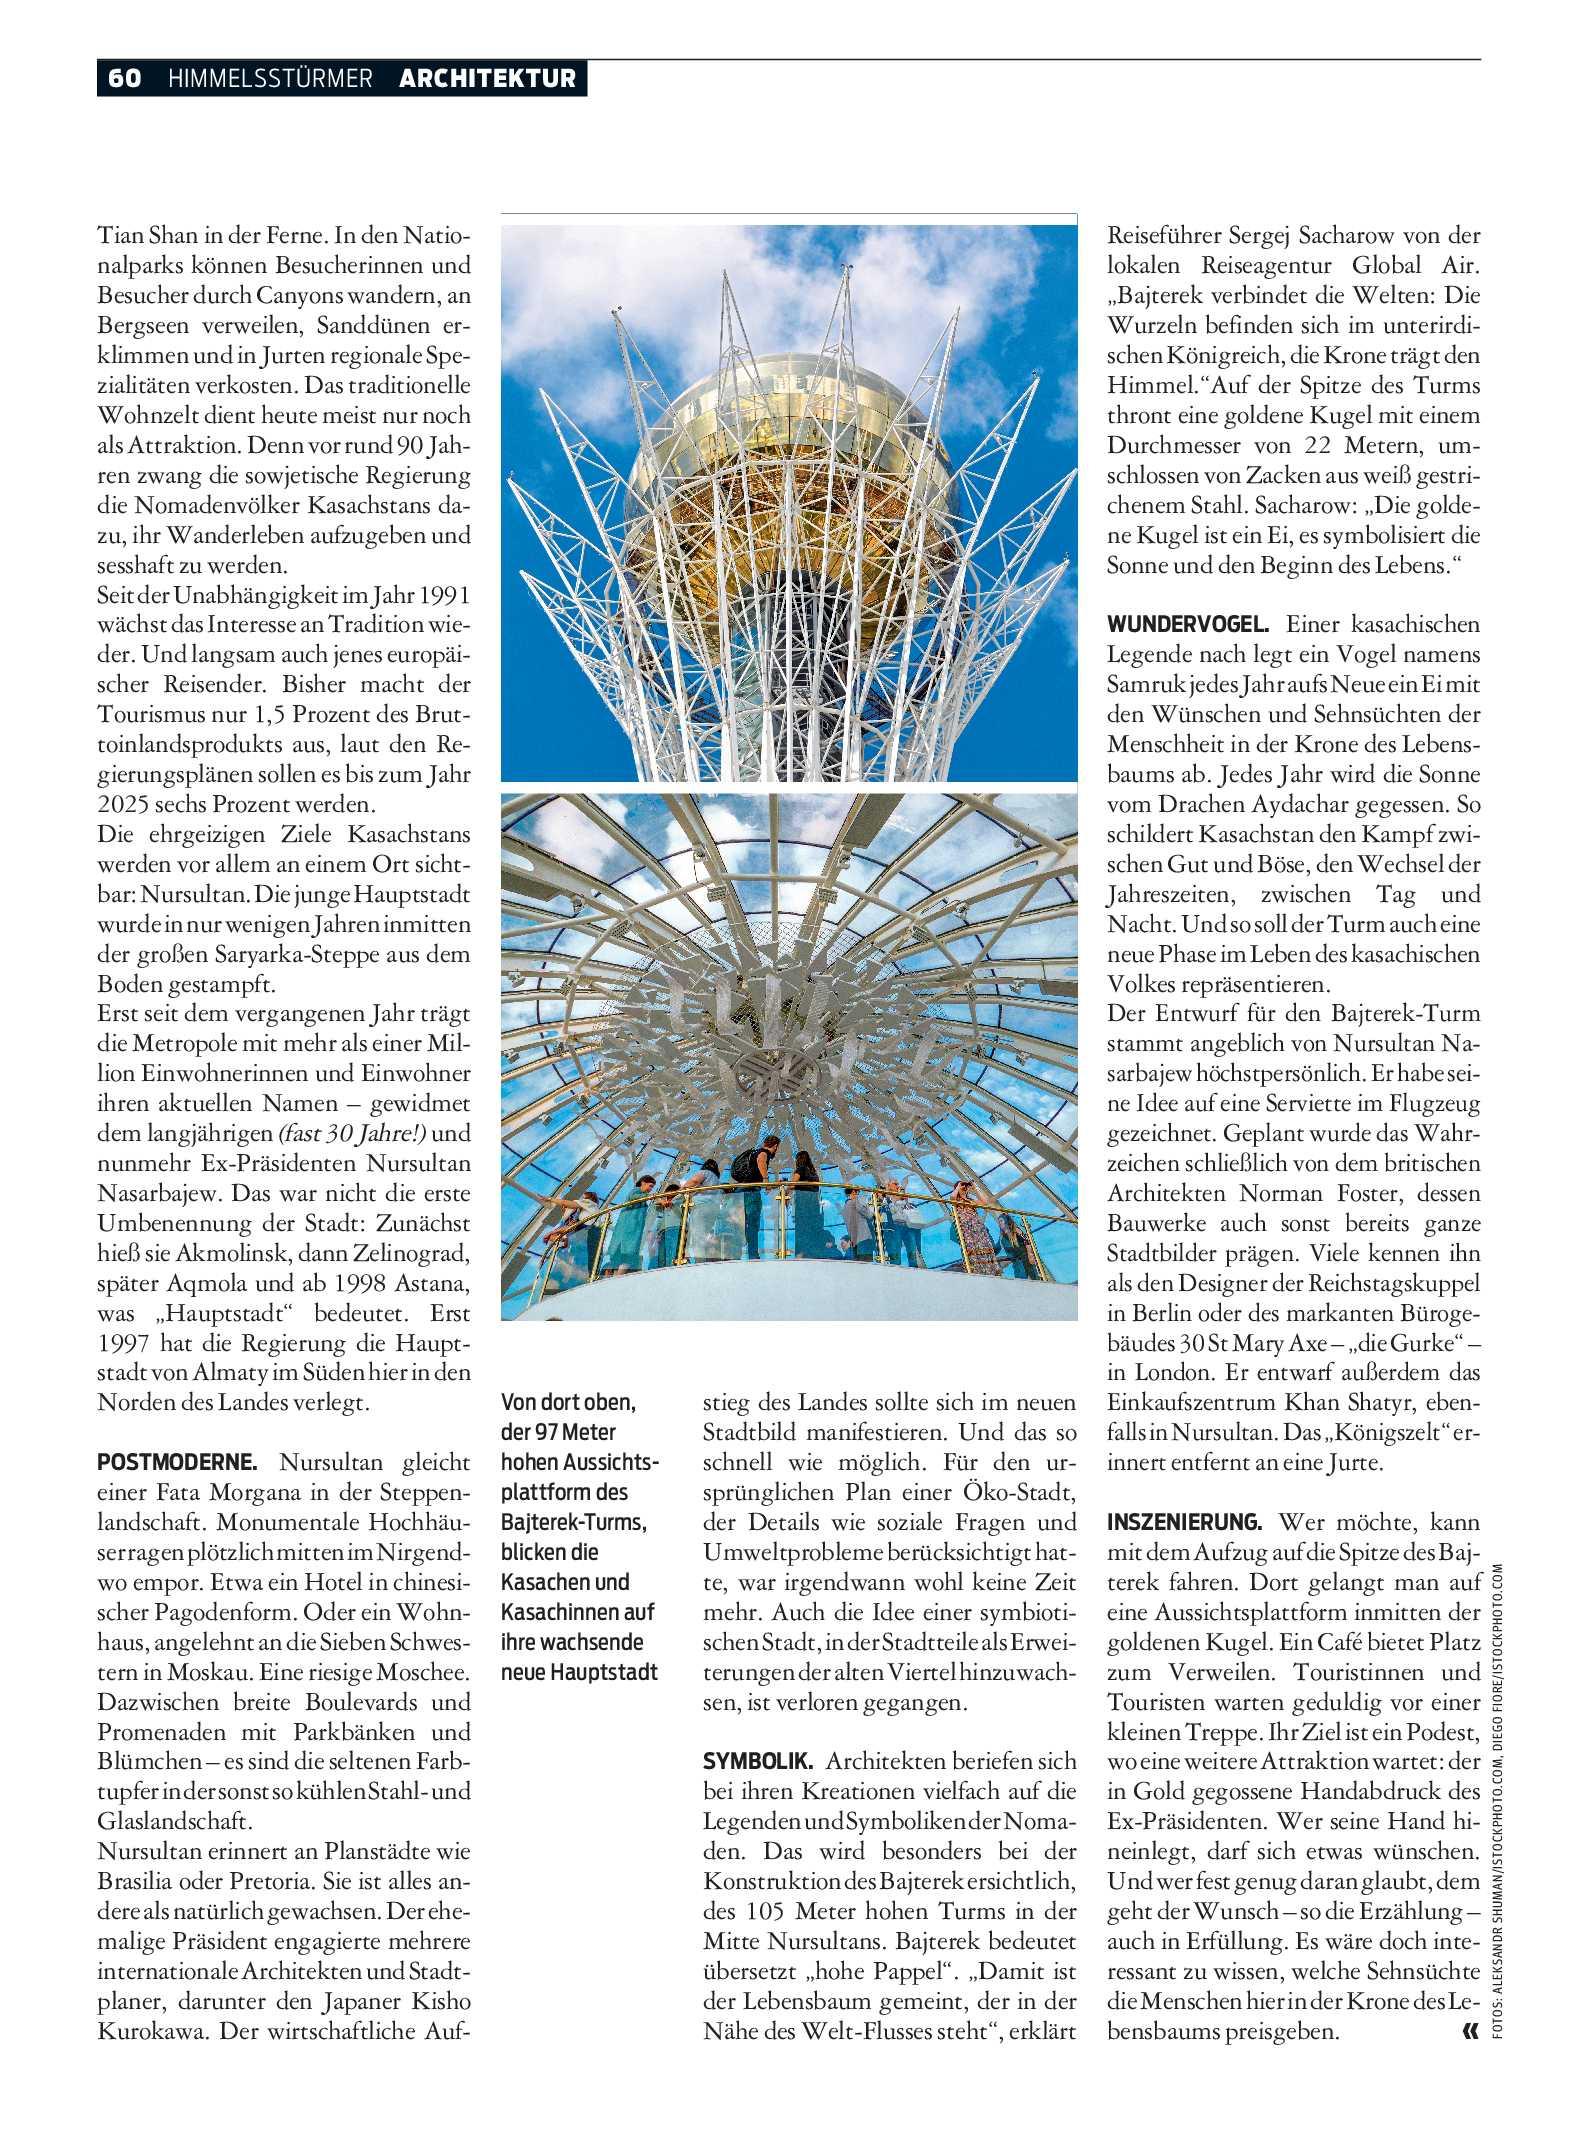 public/epaper/imported/20200930/kurier/magazin/magazin_20200930_060.jpg